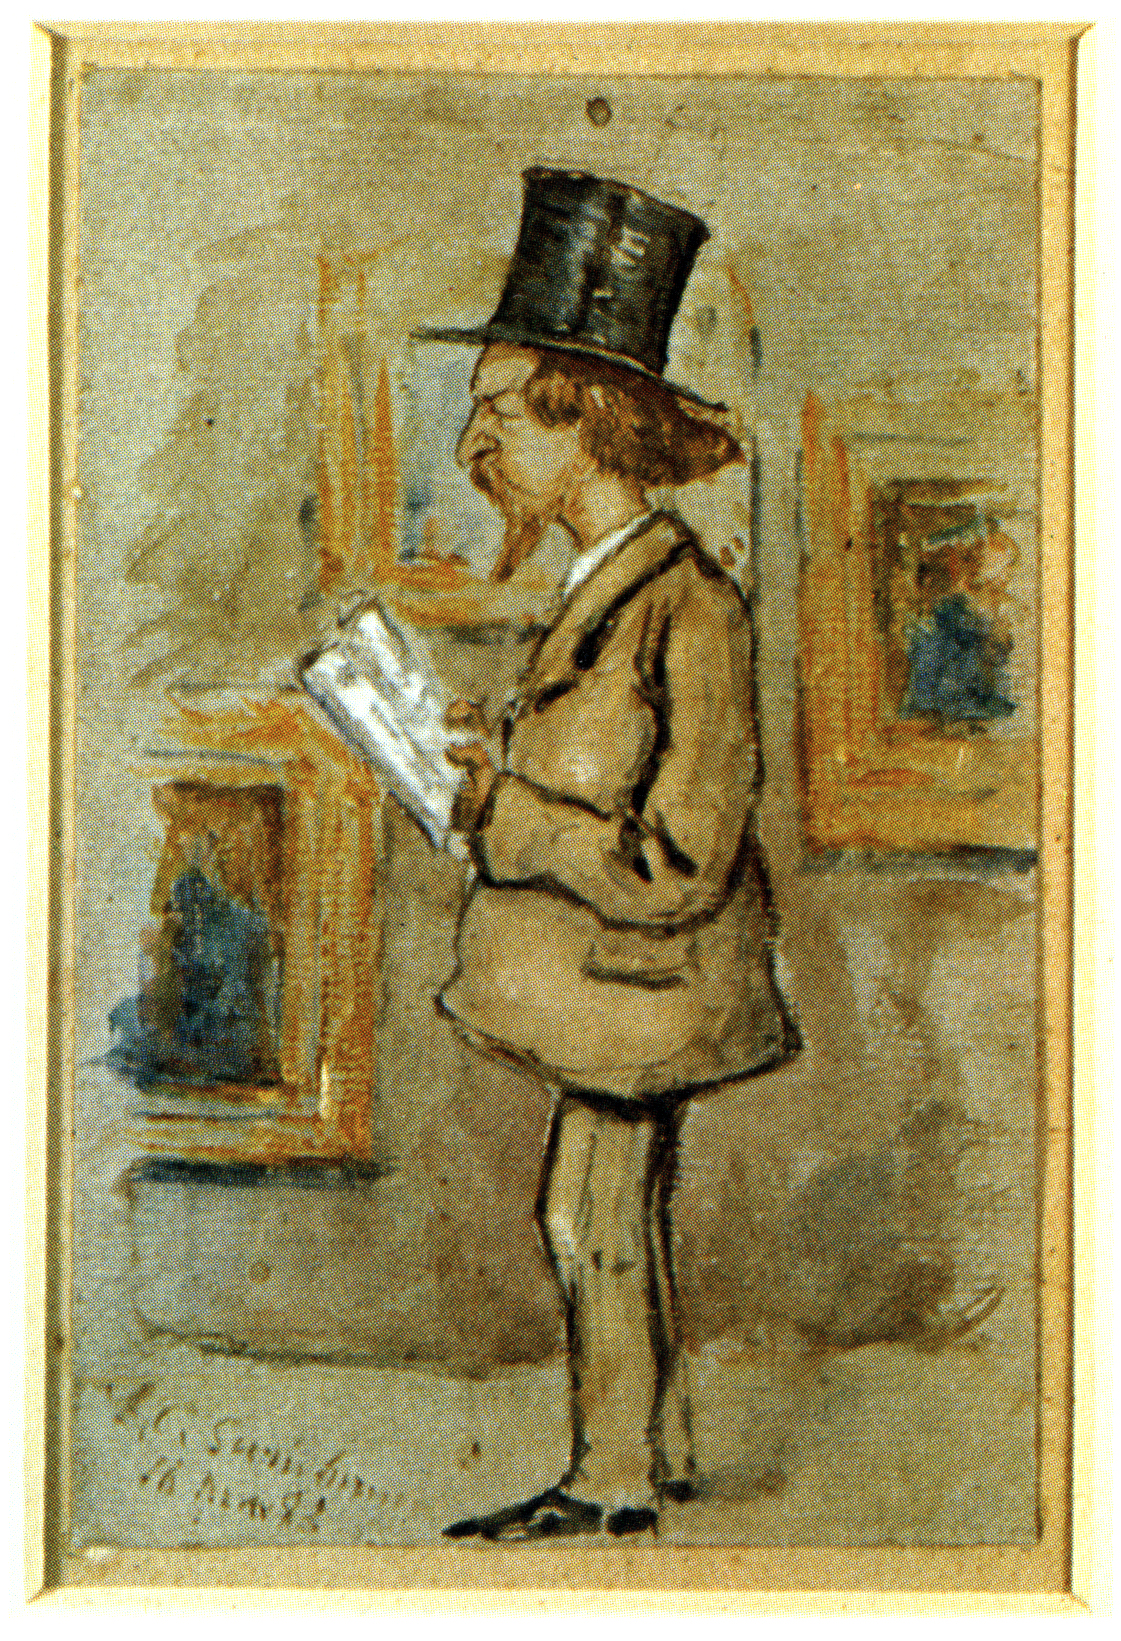 Painting of Algernon Charles Swinburne by Halkett